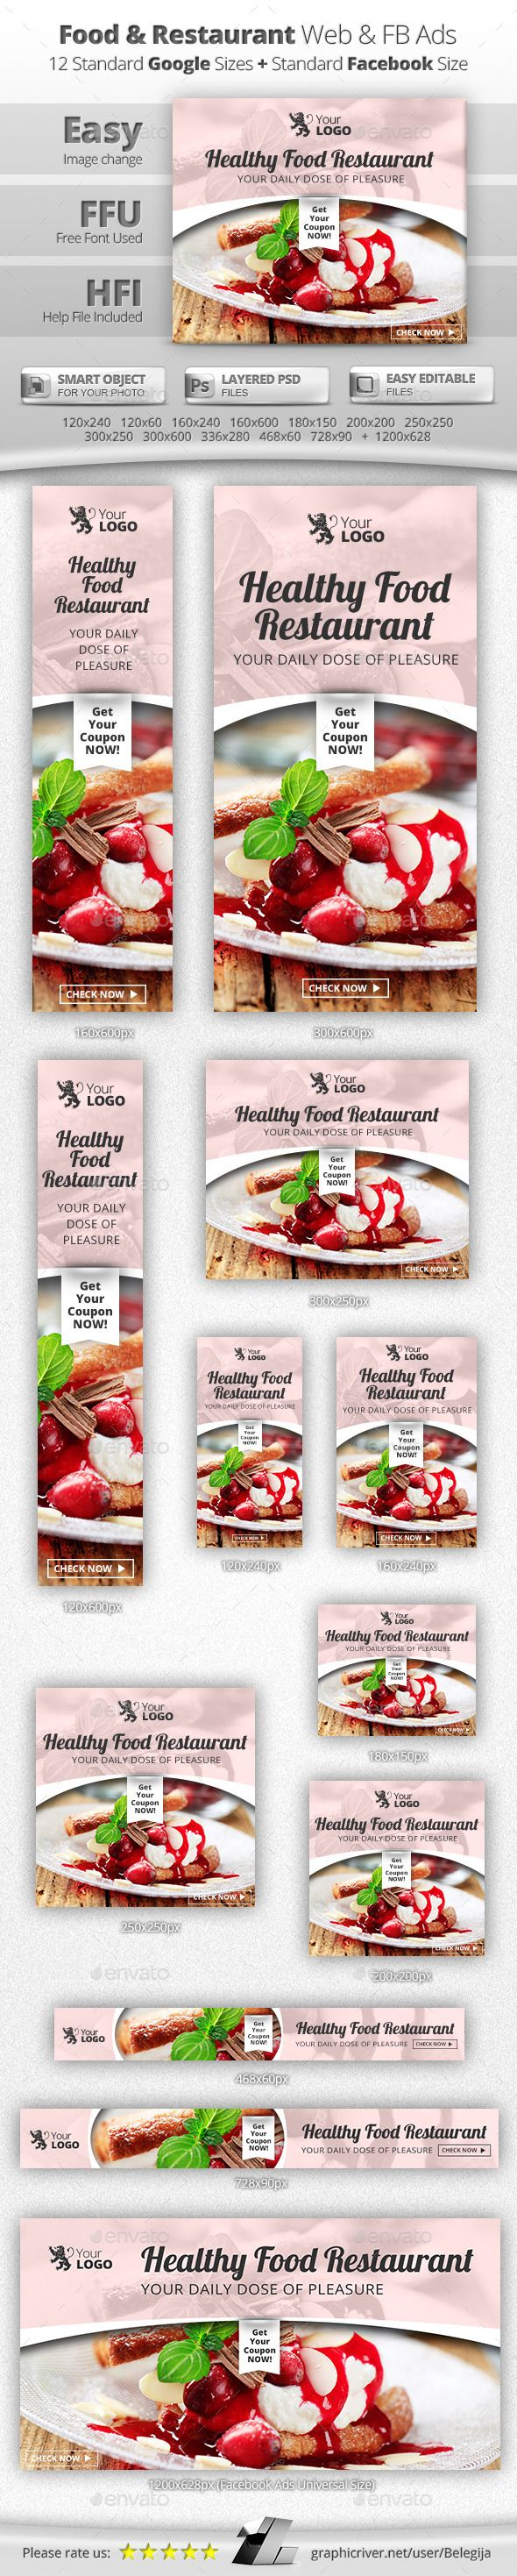 Food & Restaurant Web & Facebook Banners #design Download…